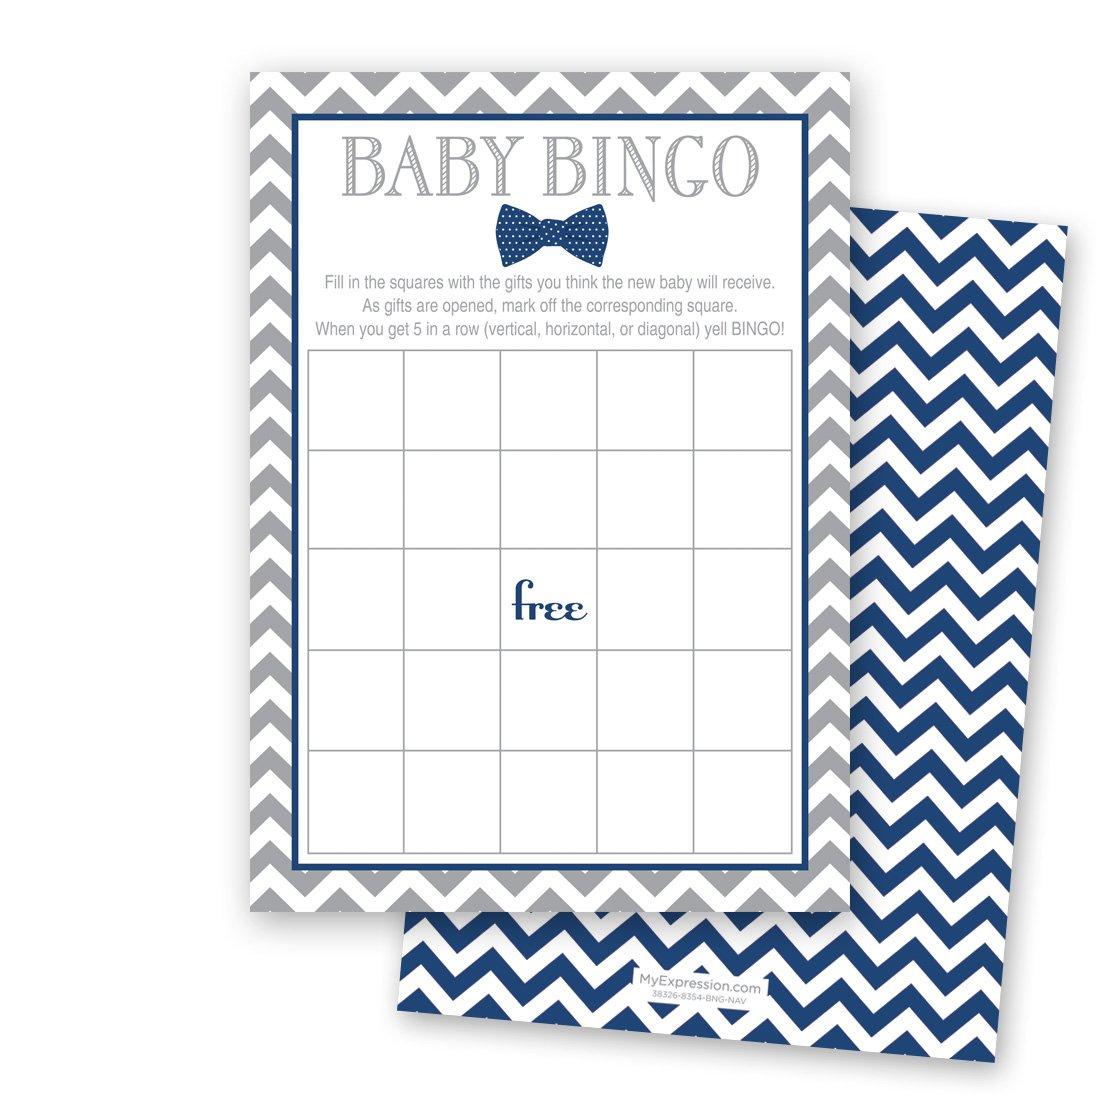 24 Bow Tie Baby Shower Bingo Cards - Littel Man Boy Baby Shower Game (Navy) by MyExpression.com